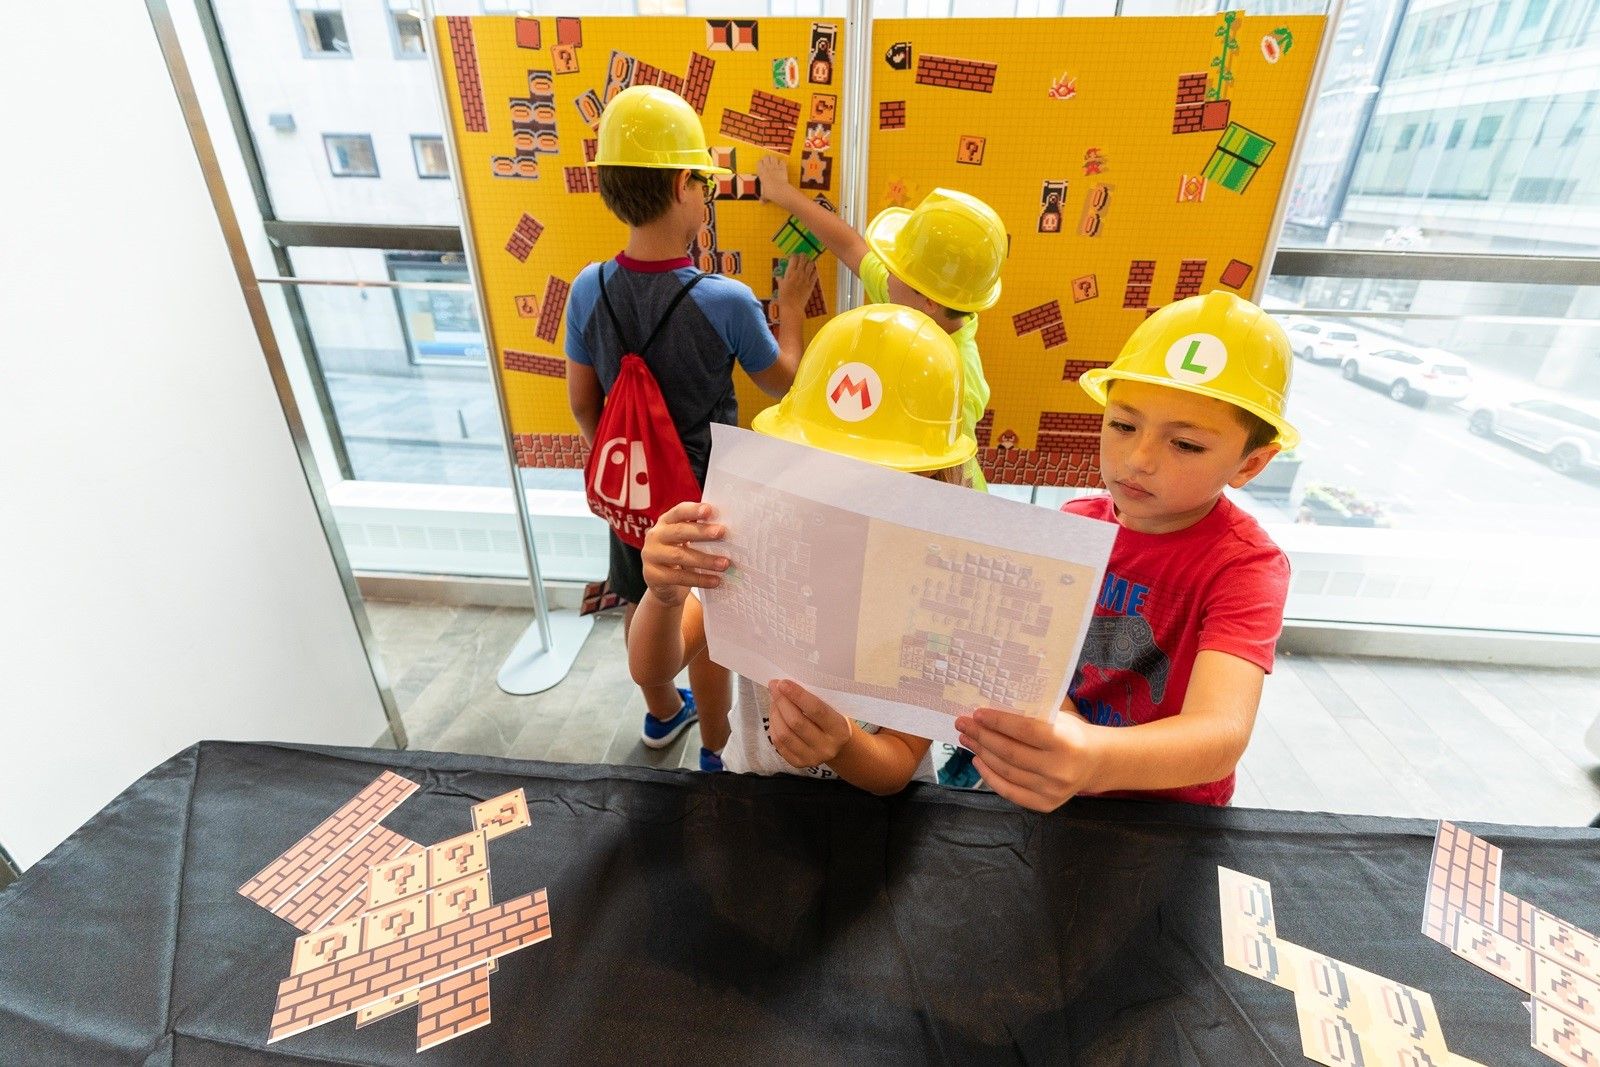 Nintendo NY hosts back-to-school event, photos